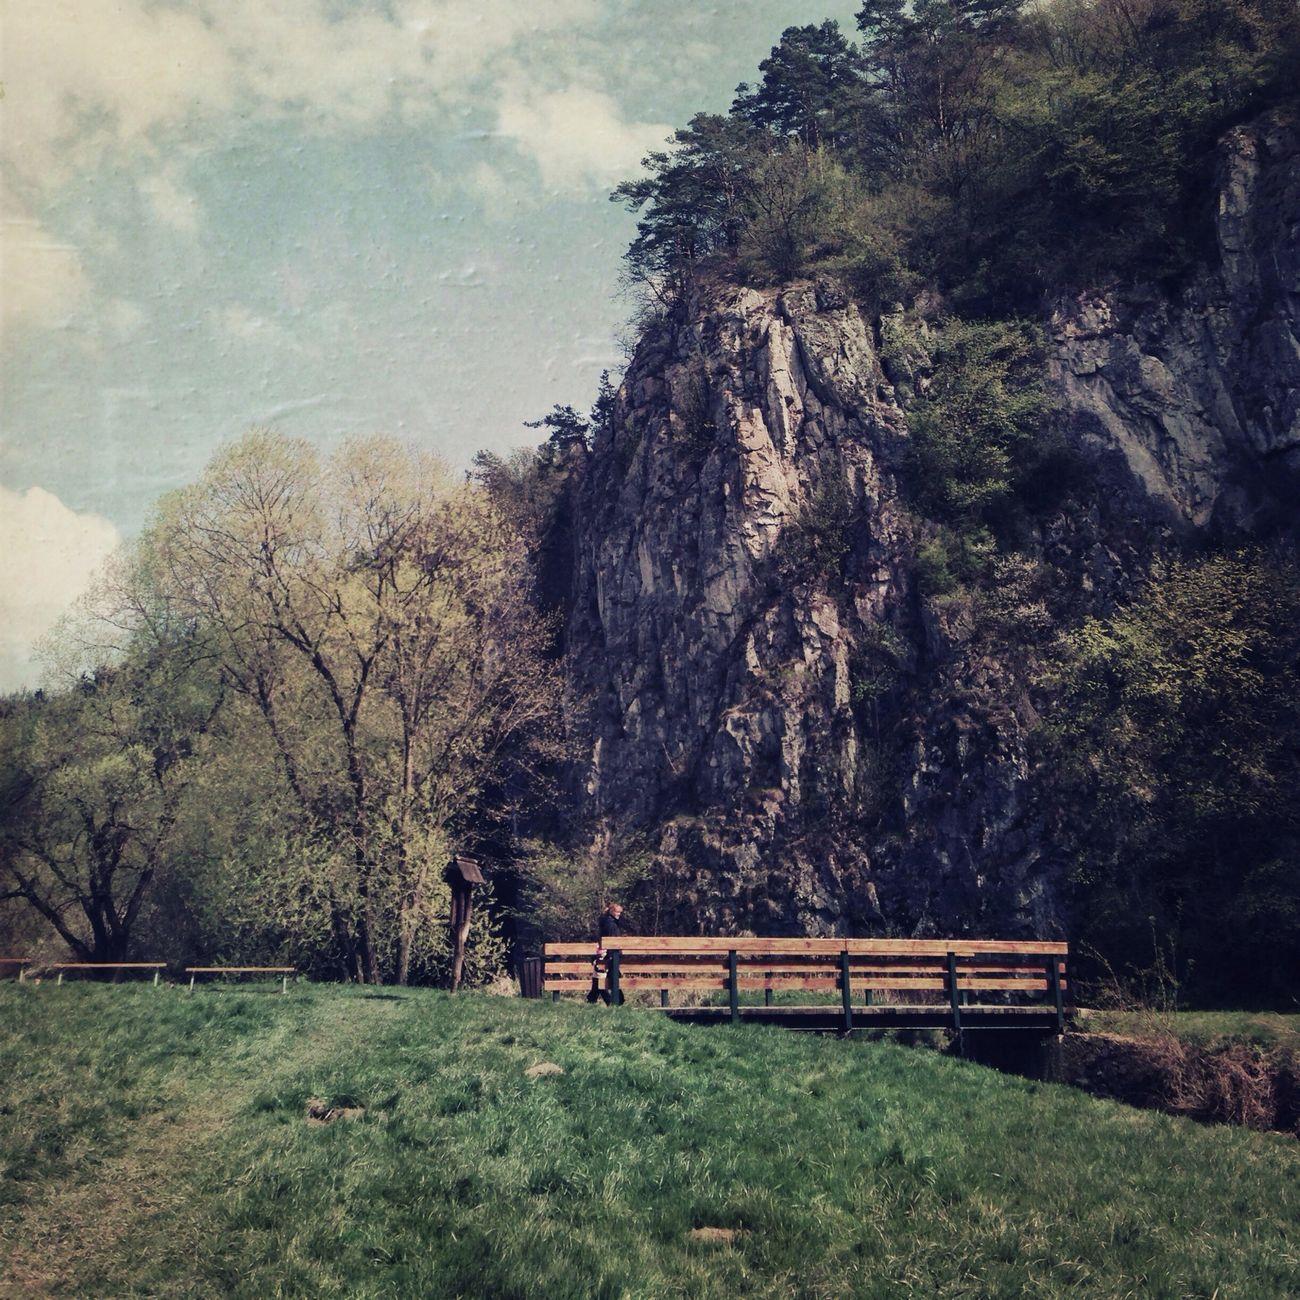 EyeEm Best Edits EyeEm Nature Lover NEM Landscapes The Explorer - 2014 EyeEm Awards